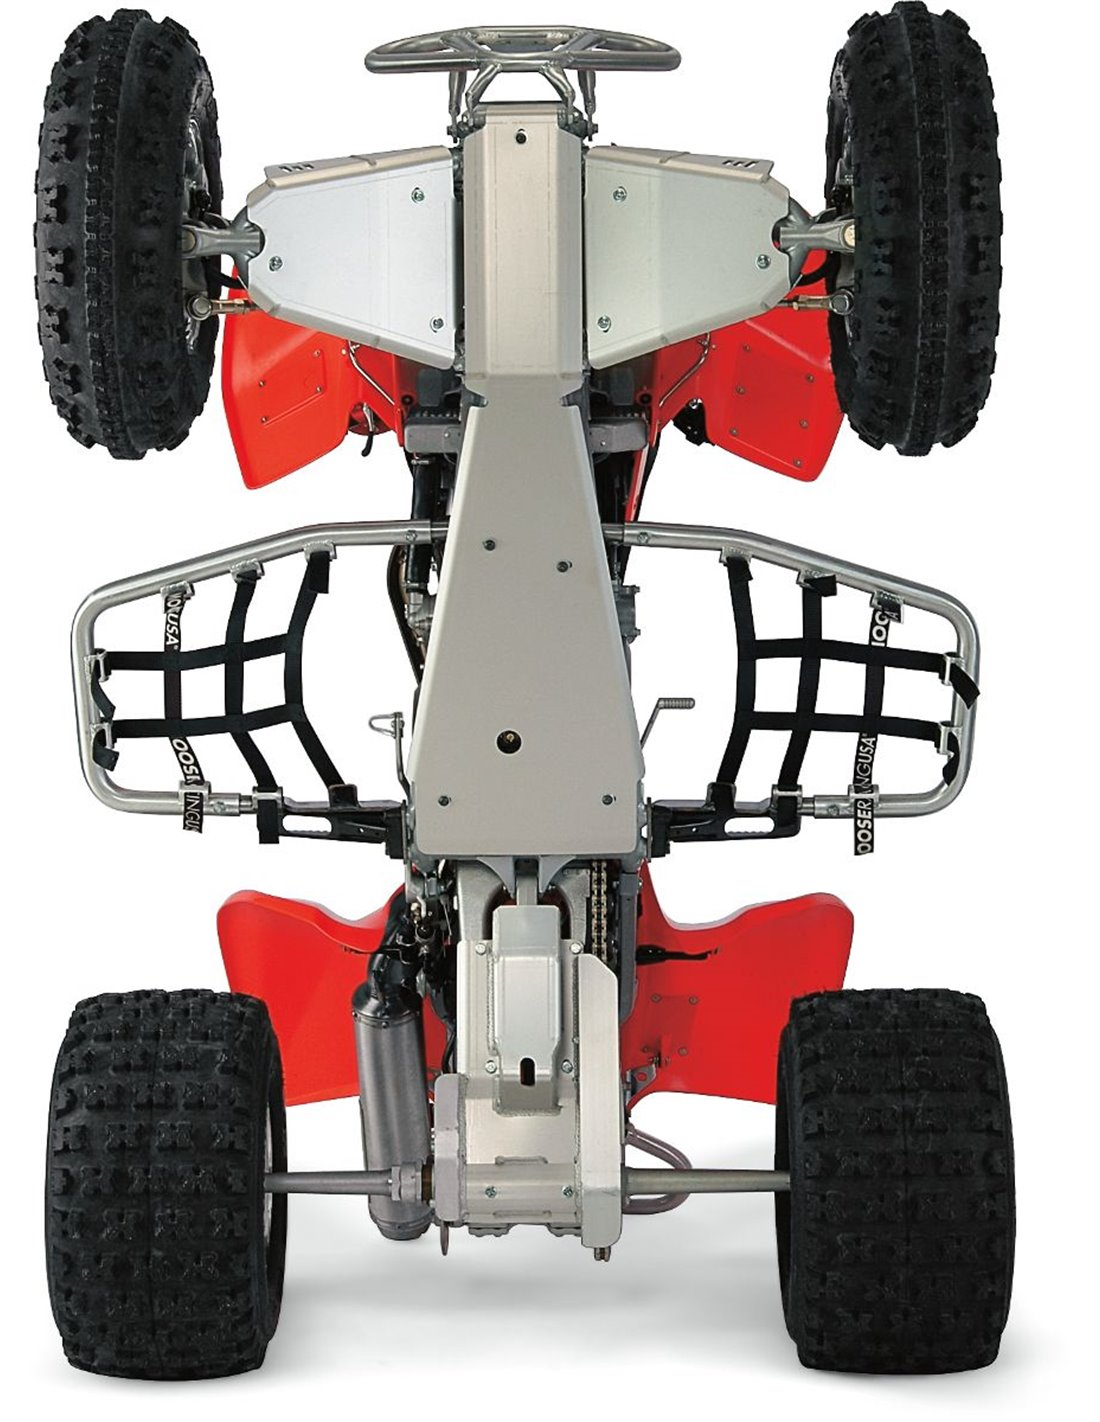 Kit de reparación Rueda Trasera Moose Racing Yamaha YFZ